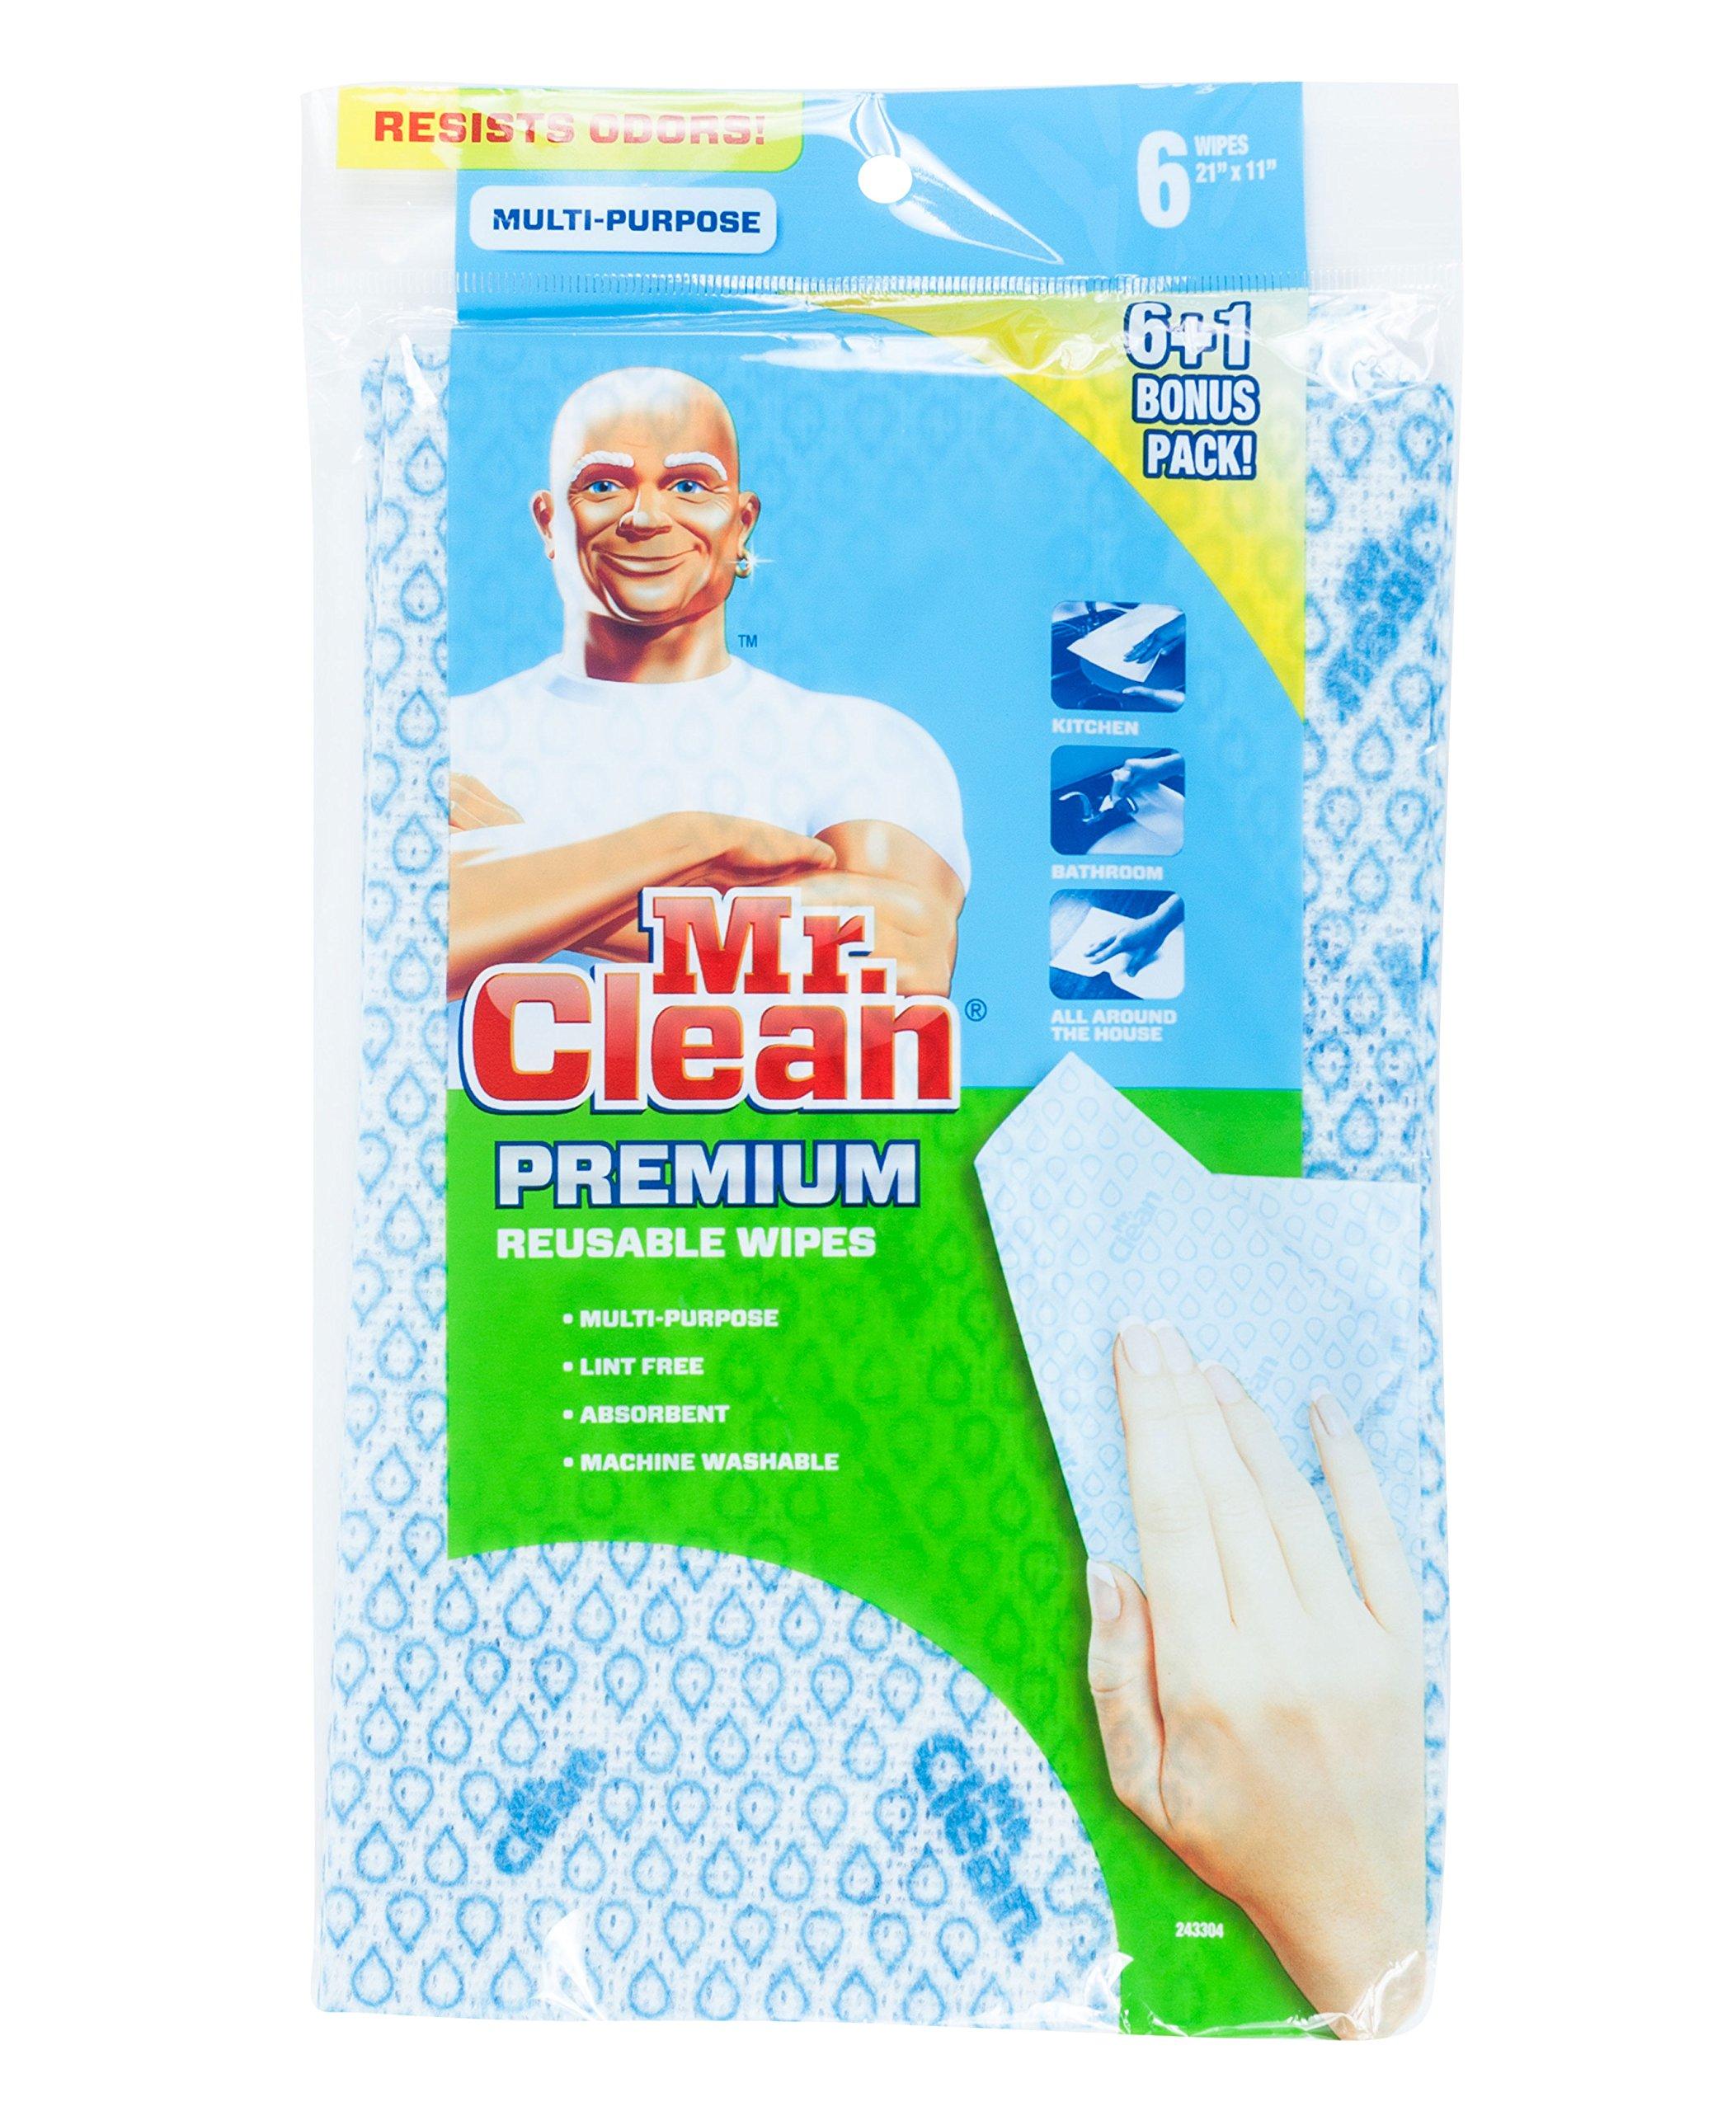 Mr. Clean Premium Reusable Wipes, Set of 7, 48-pack